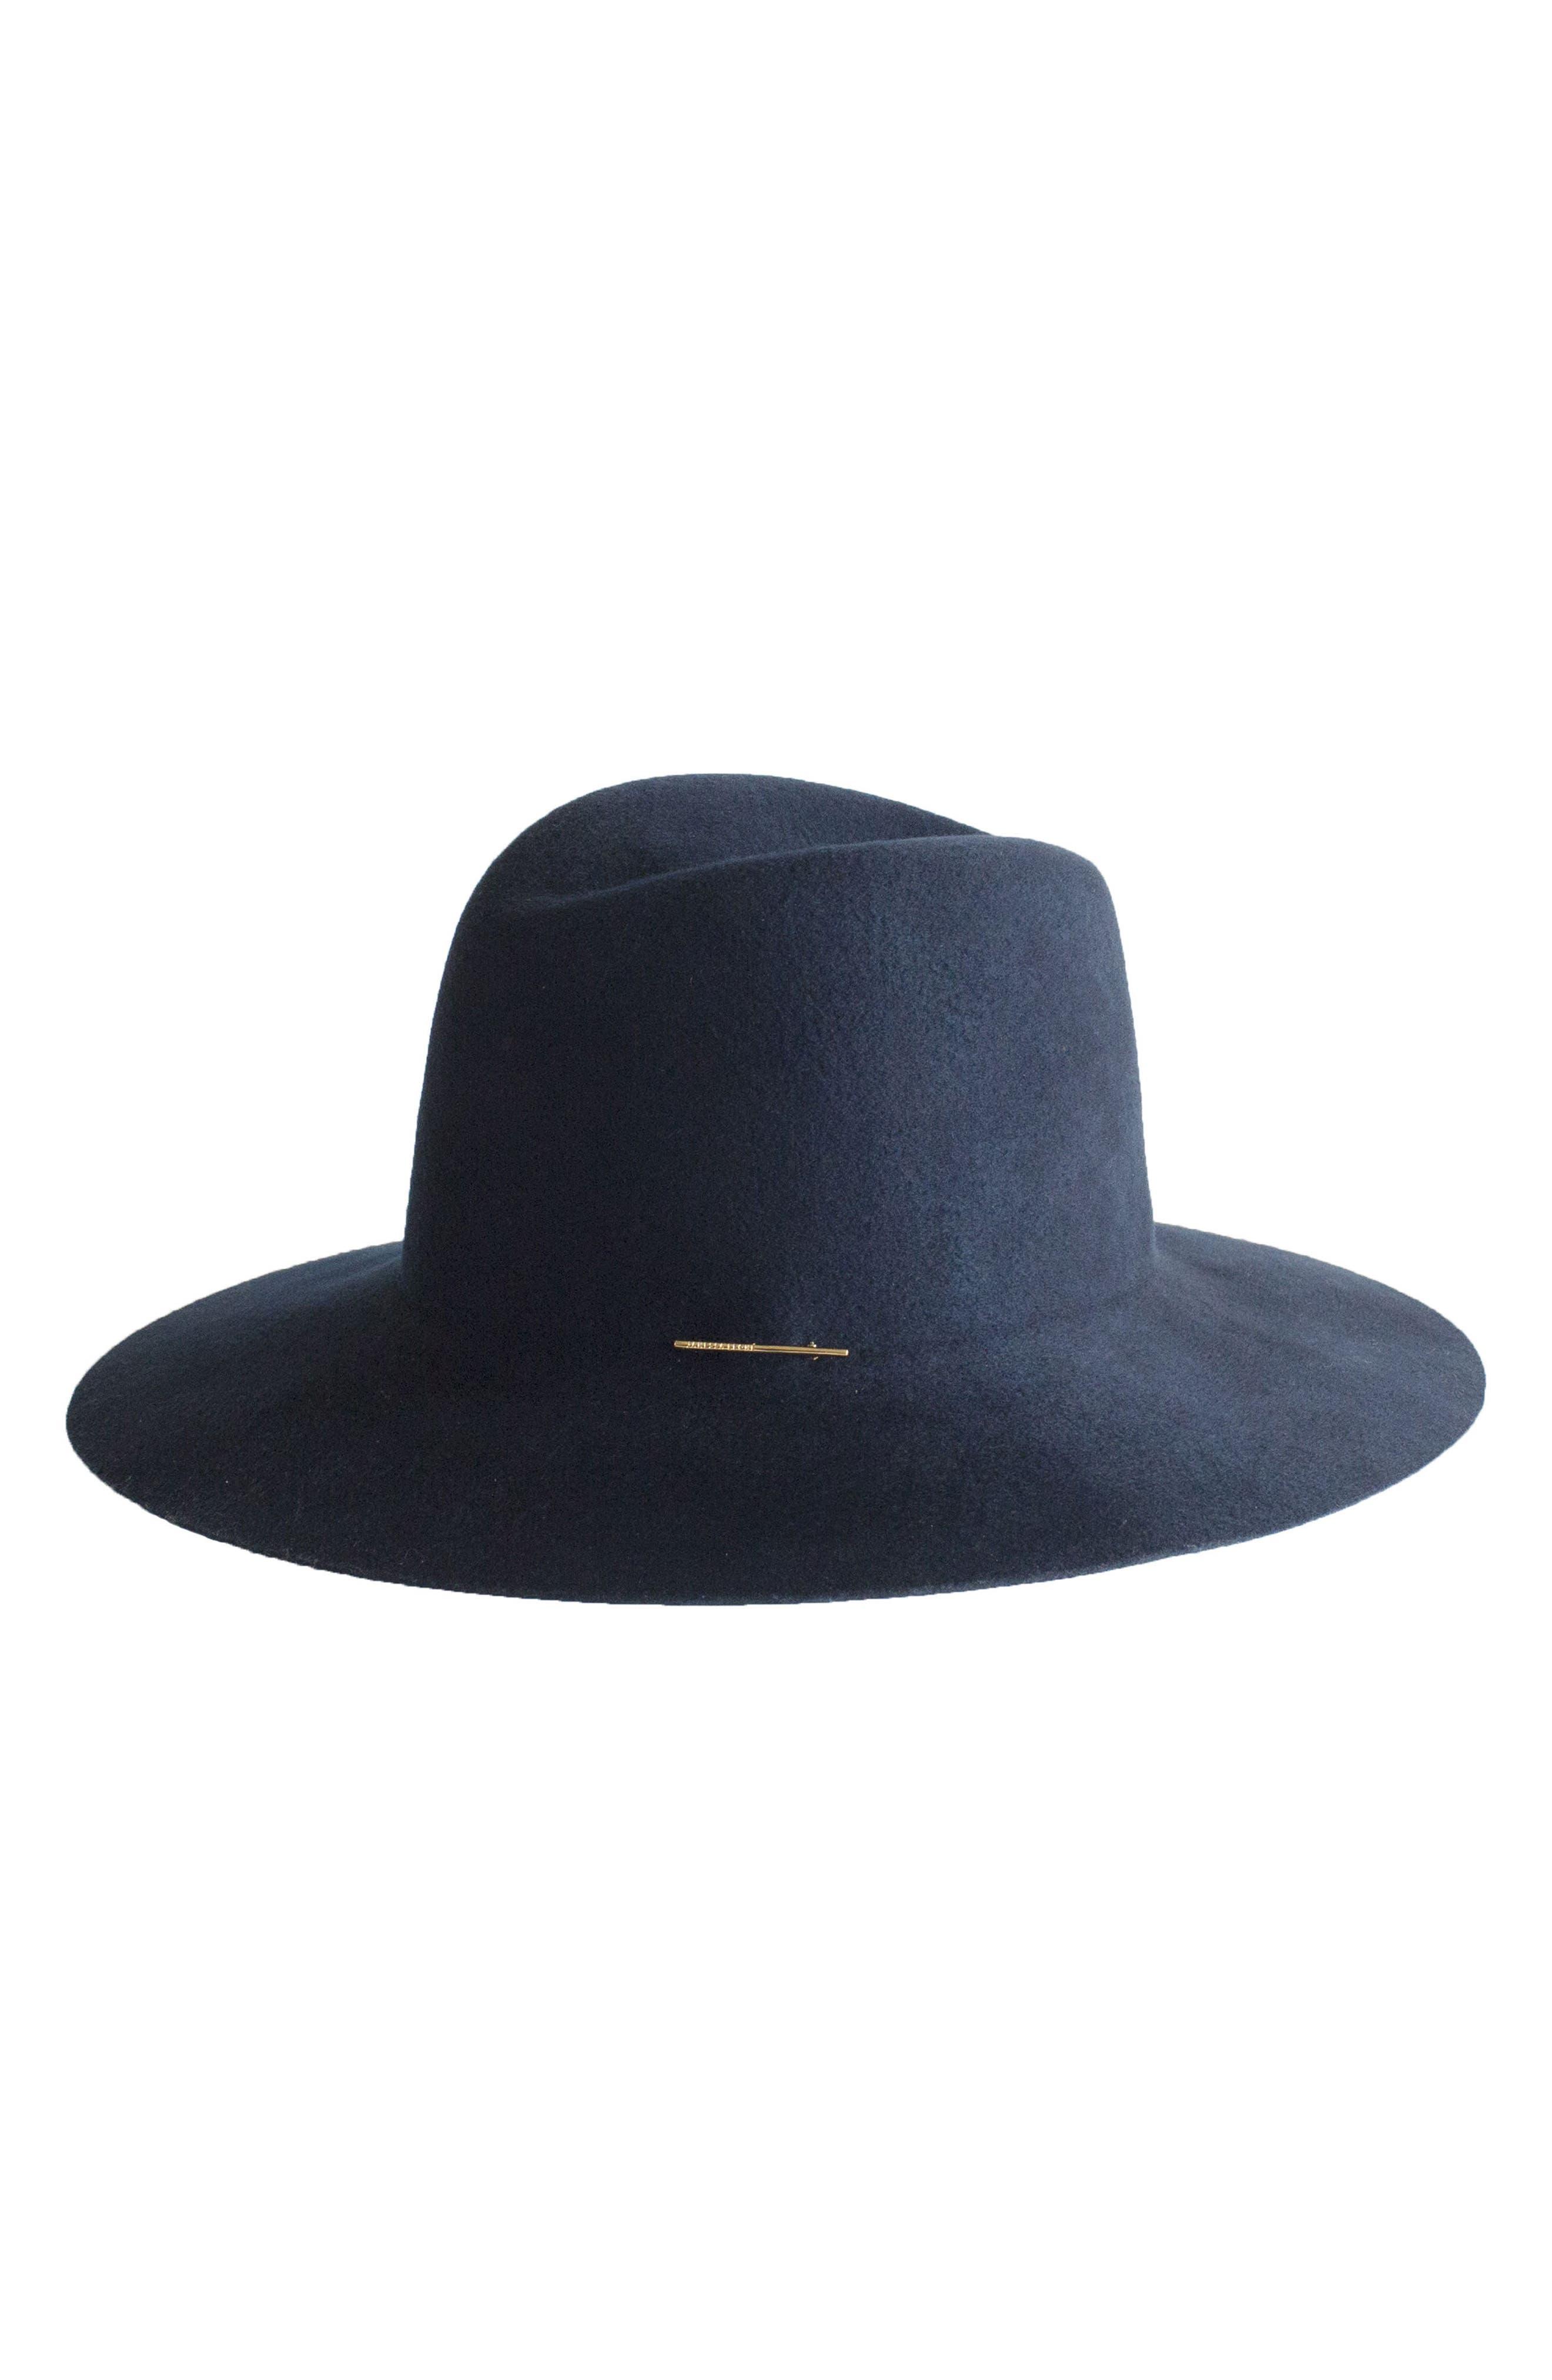 Taylor Wool Hat,                             Main thumbnail 1, color,                             Cadet Blue